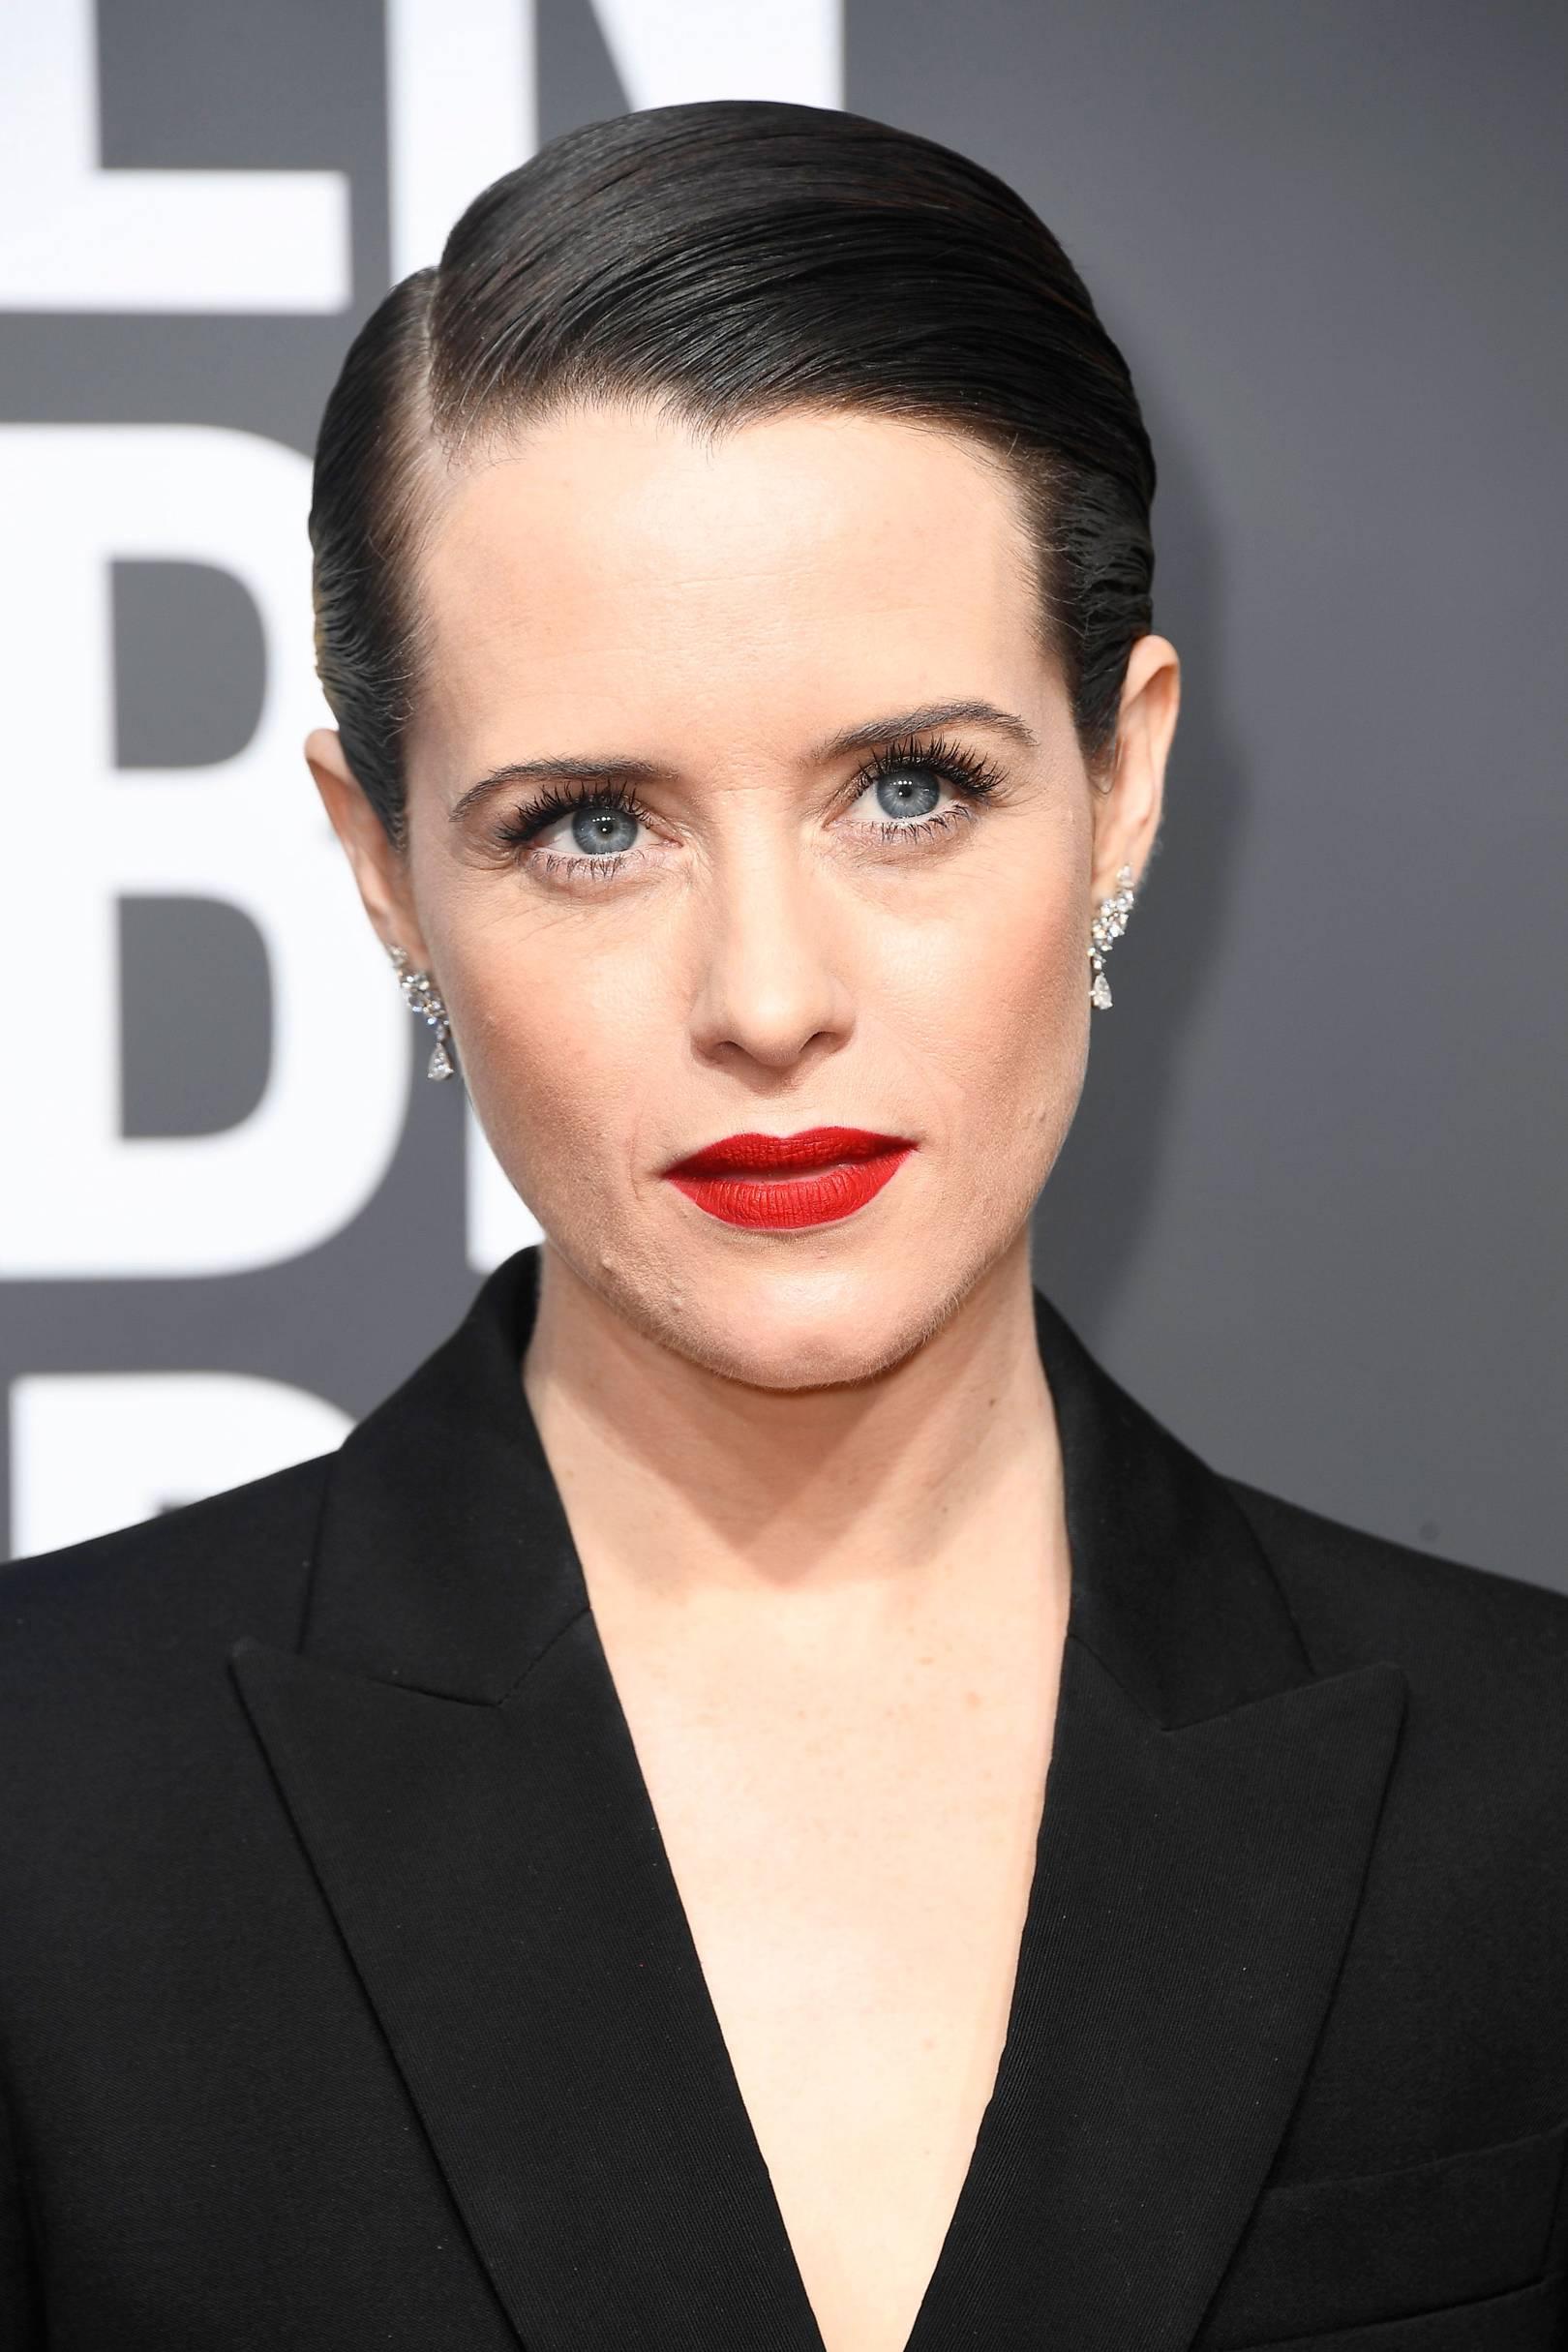 Best Beauty Looks from Golden Globes 2019 Best Beauty Looks from Golden Globes 2019 new images